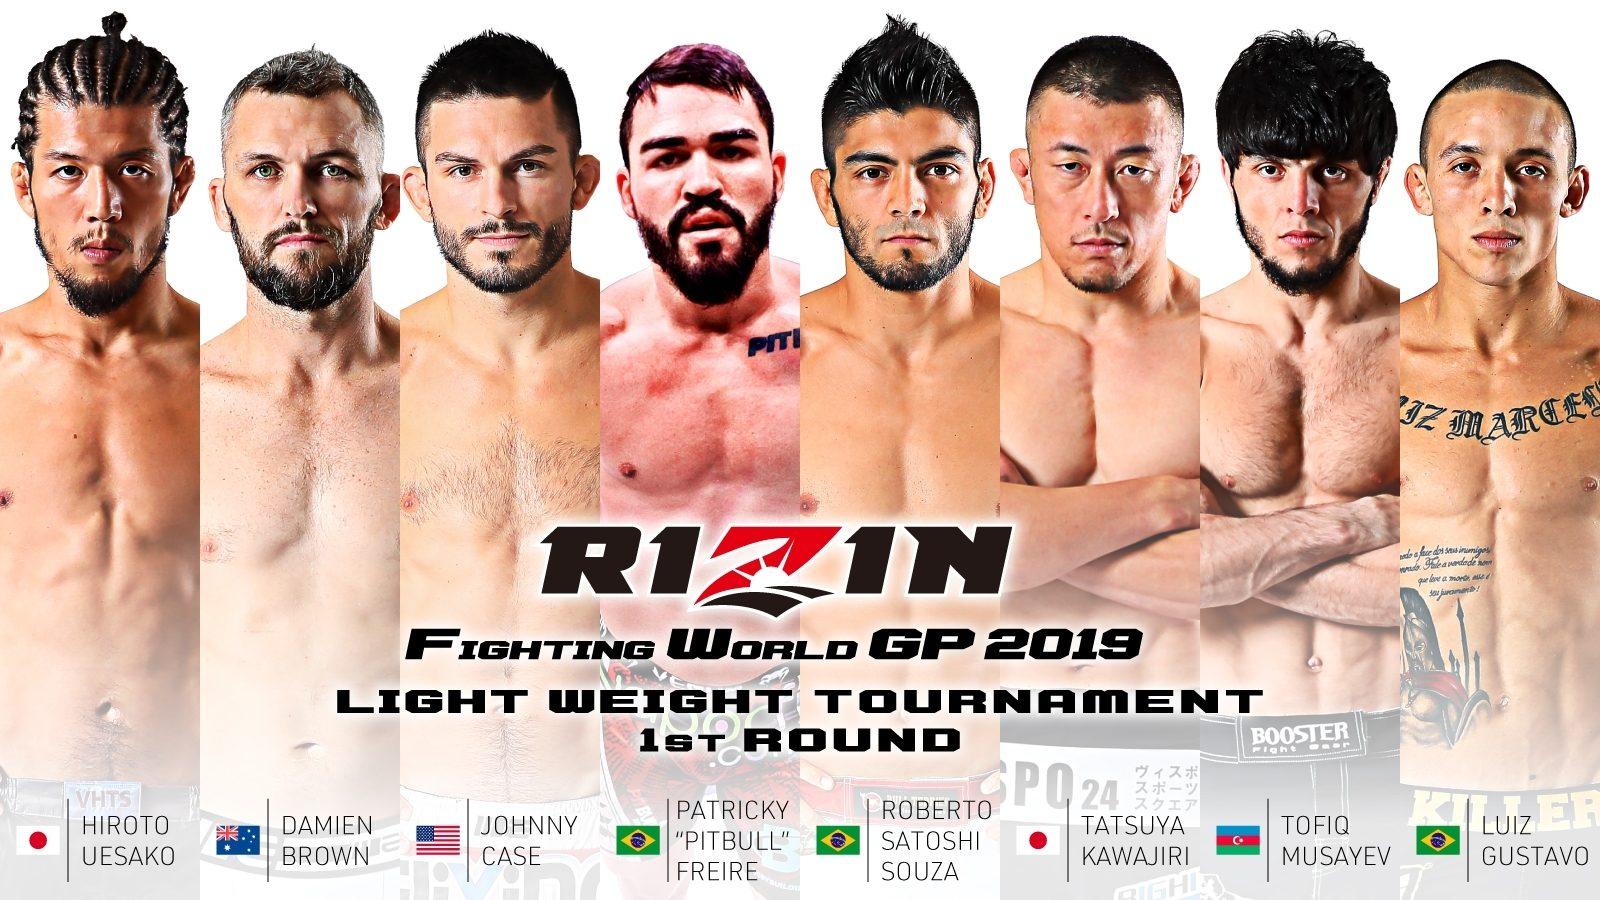 RIZIN 19: Lightweight GP Participants Announced